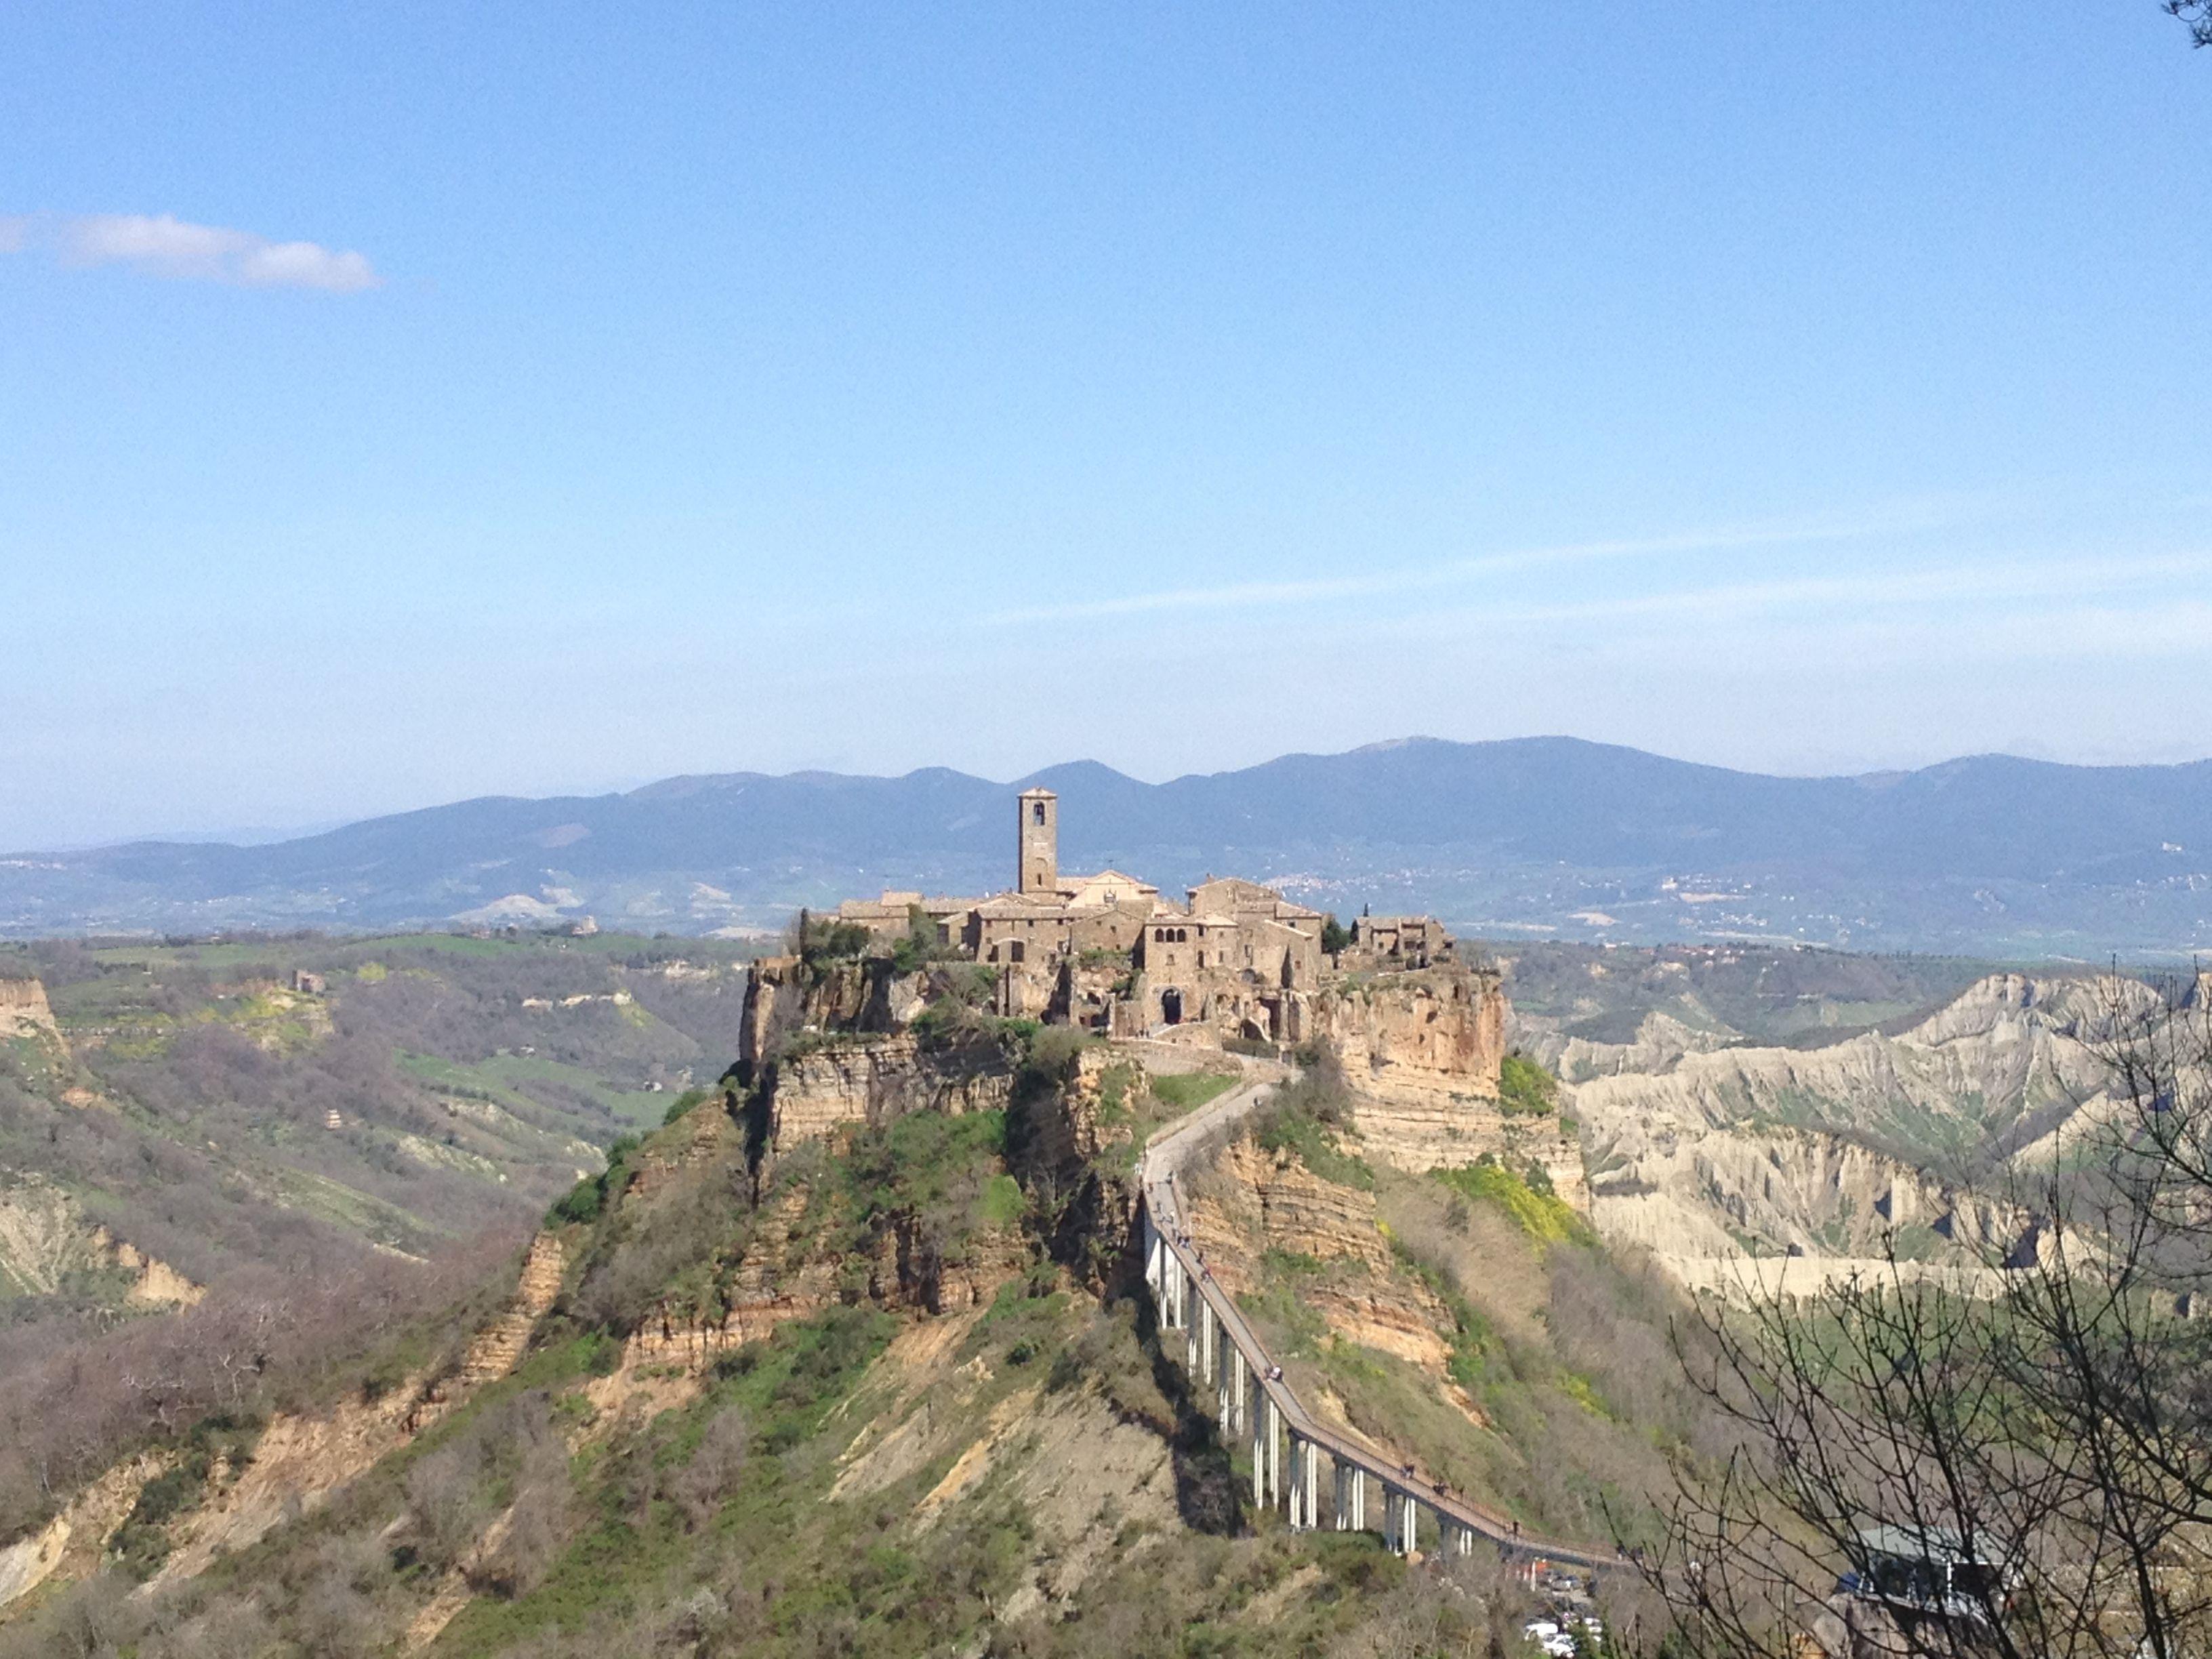 Day Trip To The Stunning Town Of Civita Di Bagnoregio Day Trips